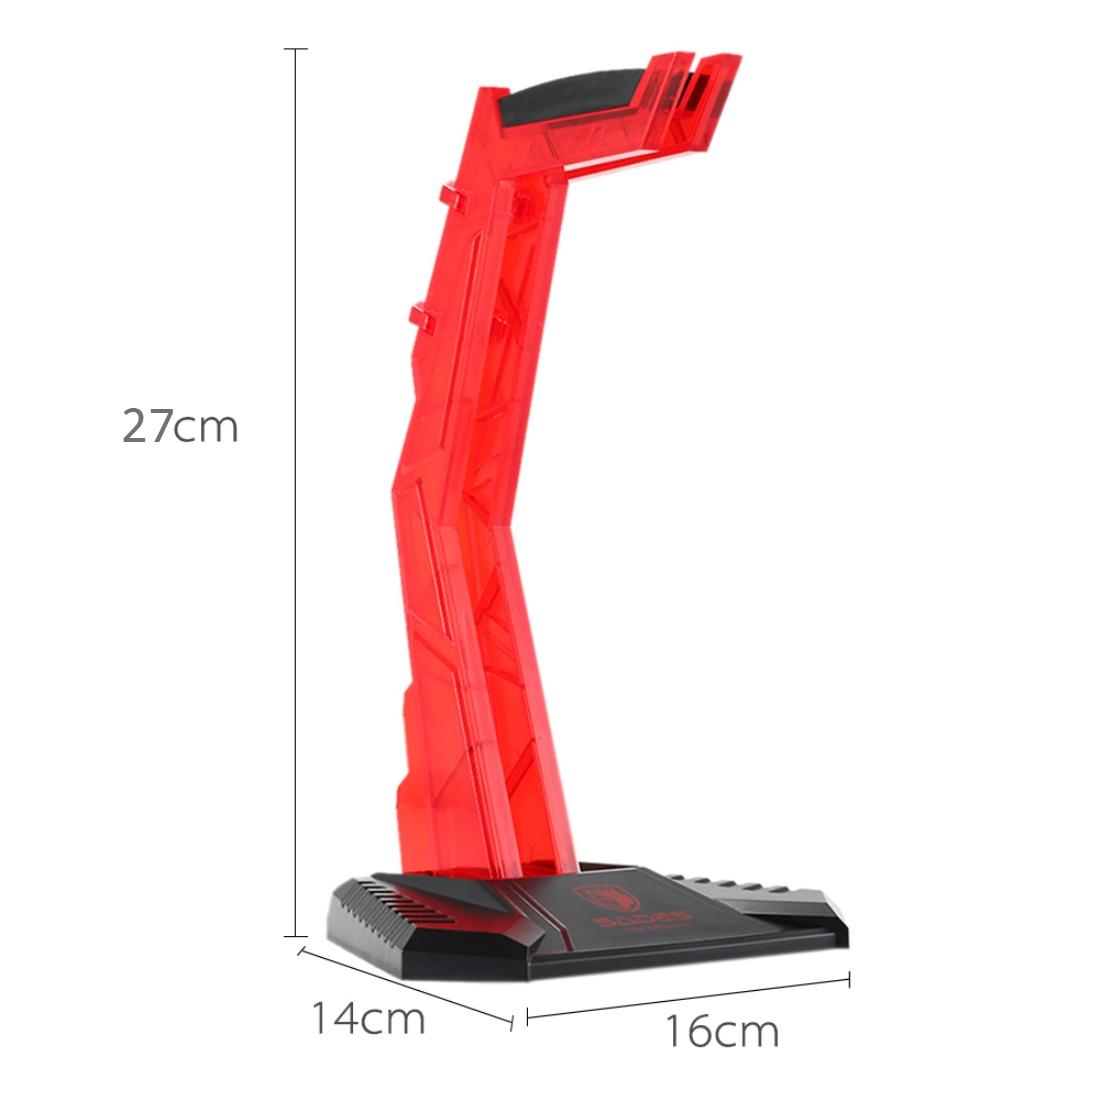 SADES Universal Multi-function Gaming Headphone Hanger Desk Headset Stand Holder Display Rack (Red)